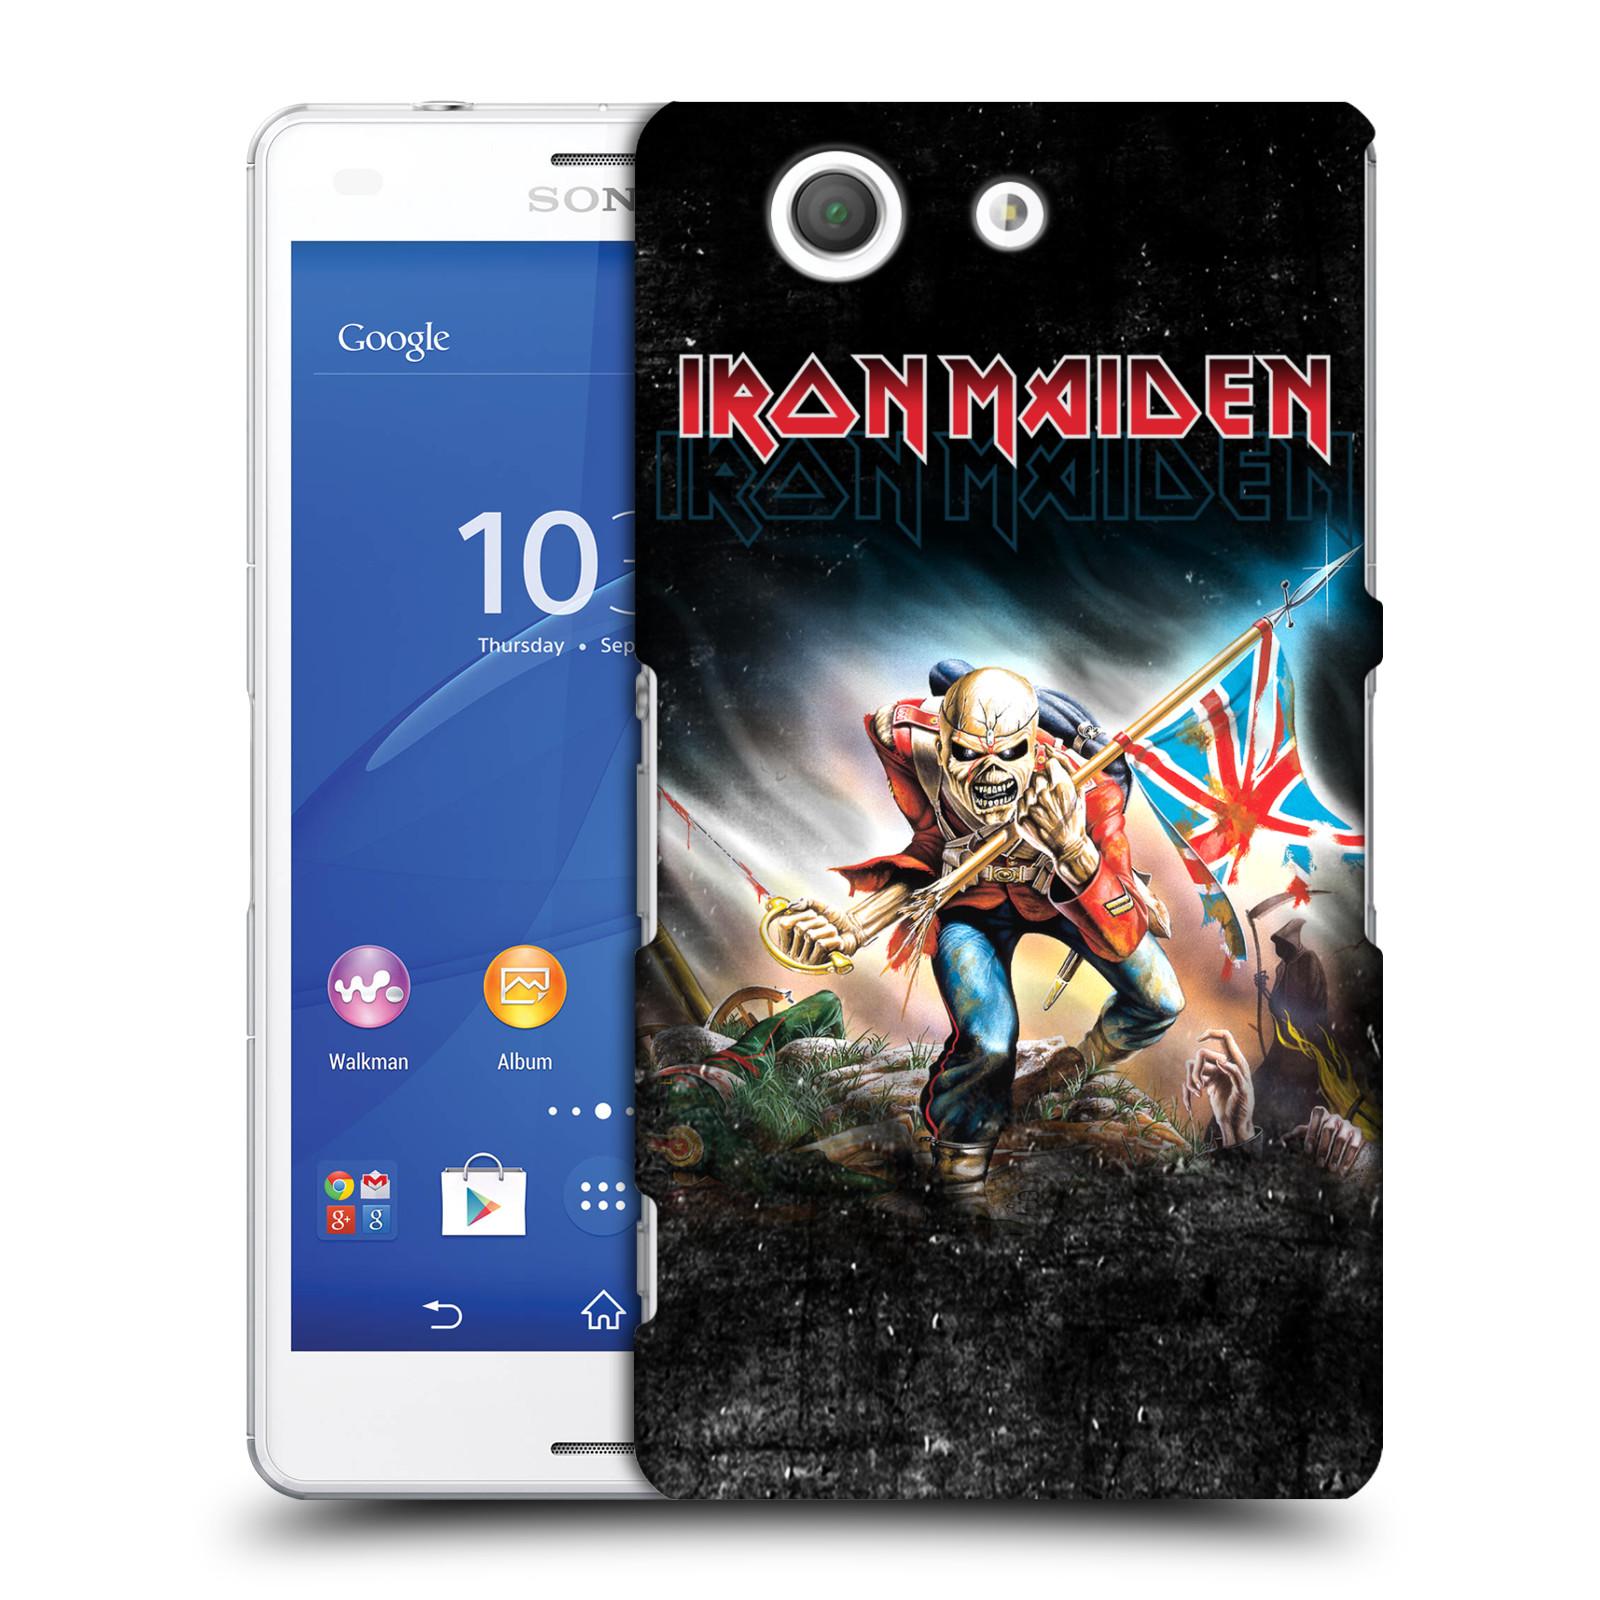 Plastové pouzdro na mobil Sony Xperia Z3 Compact D5803 HEAD CASE - Iron Maiden - Trooper 2016